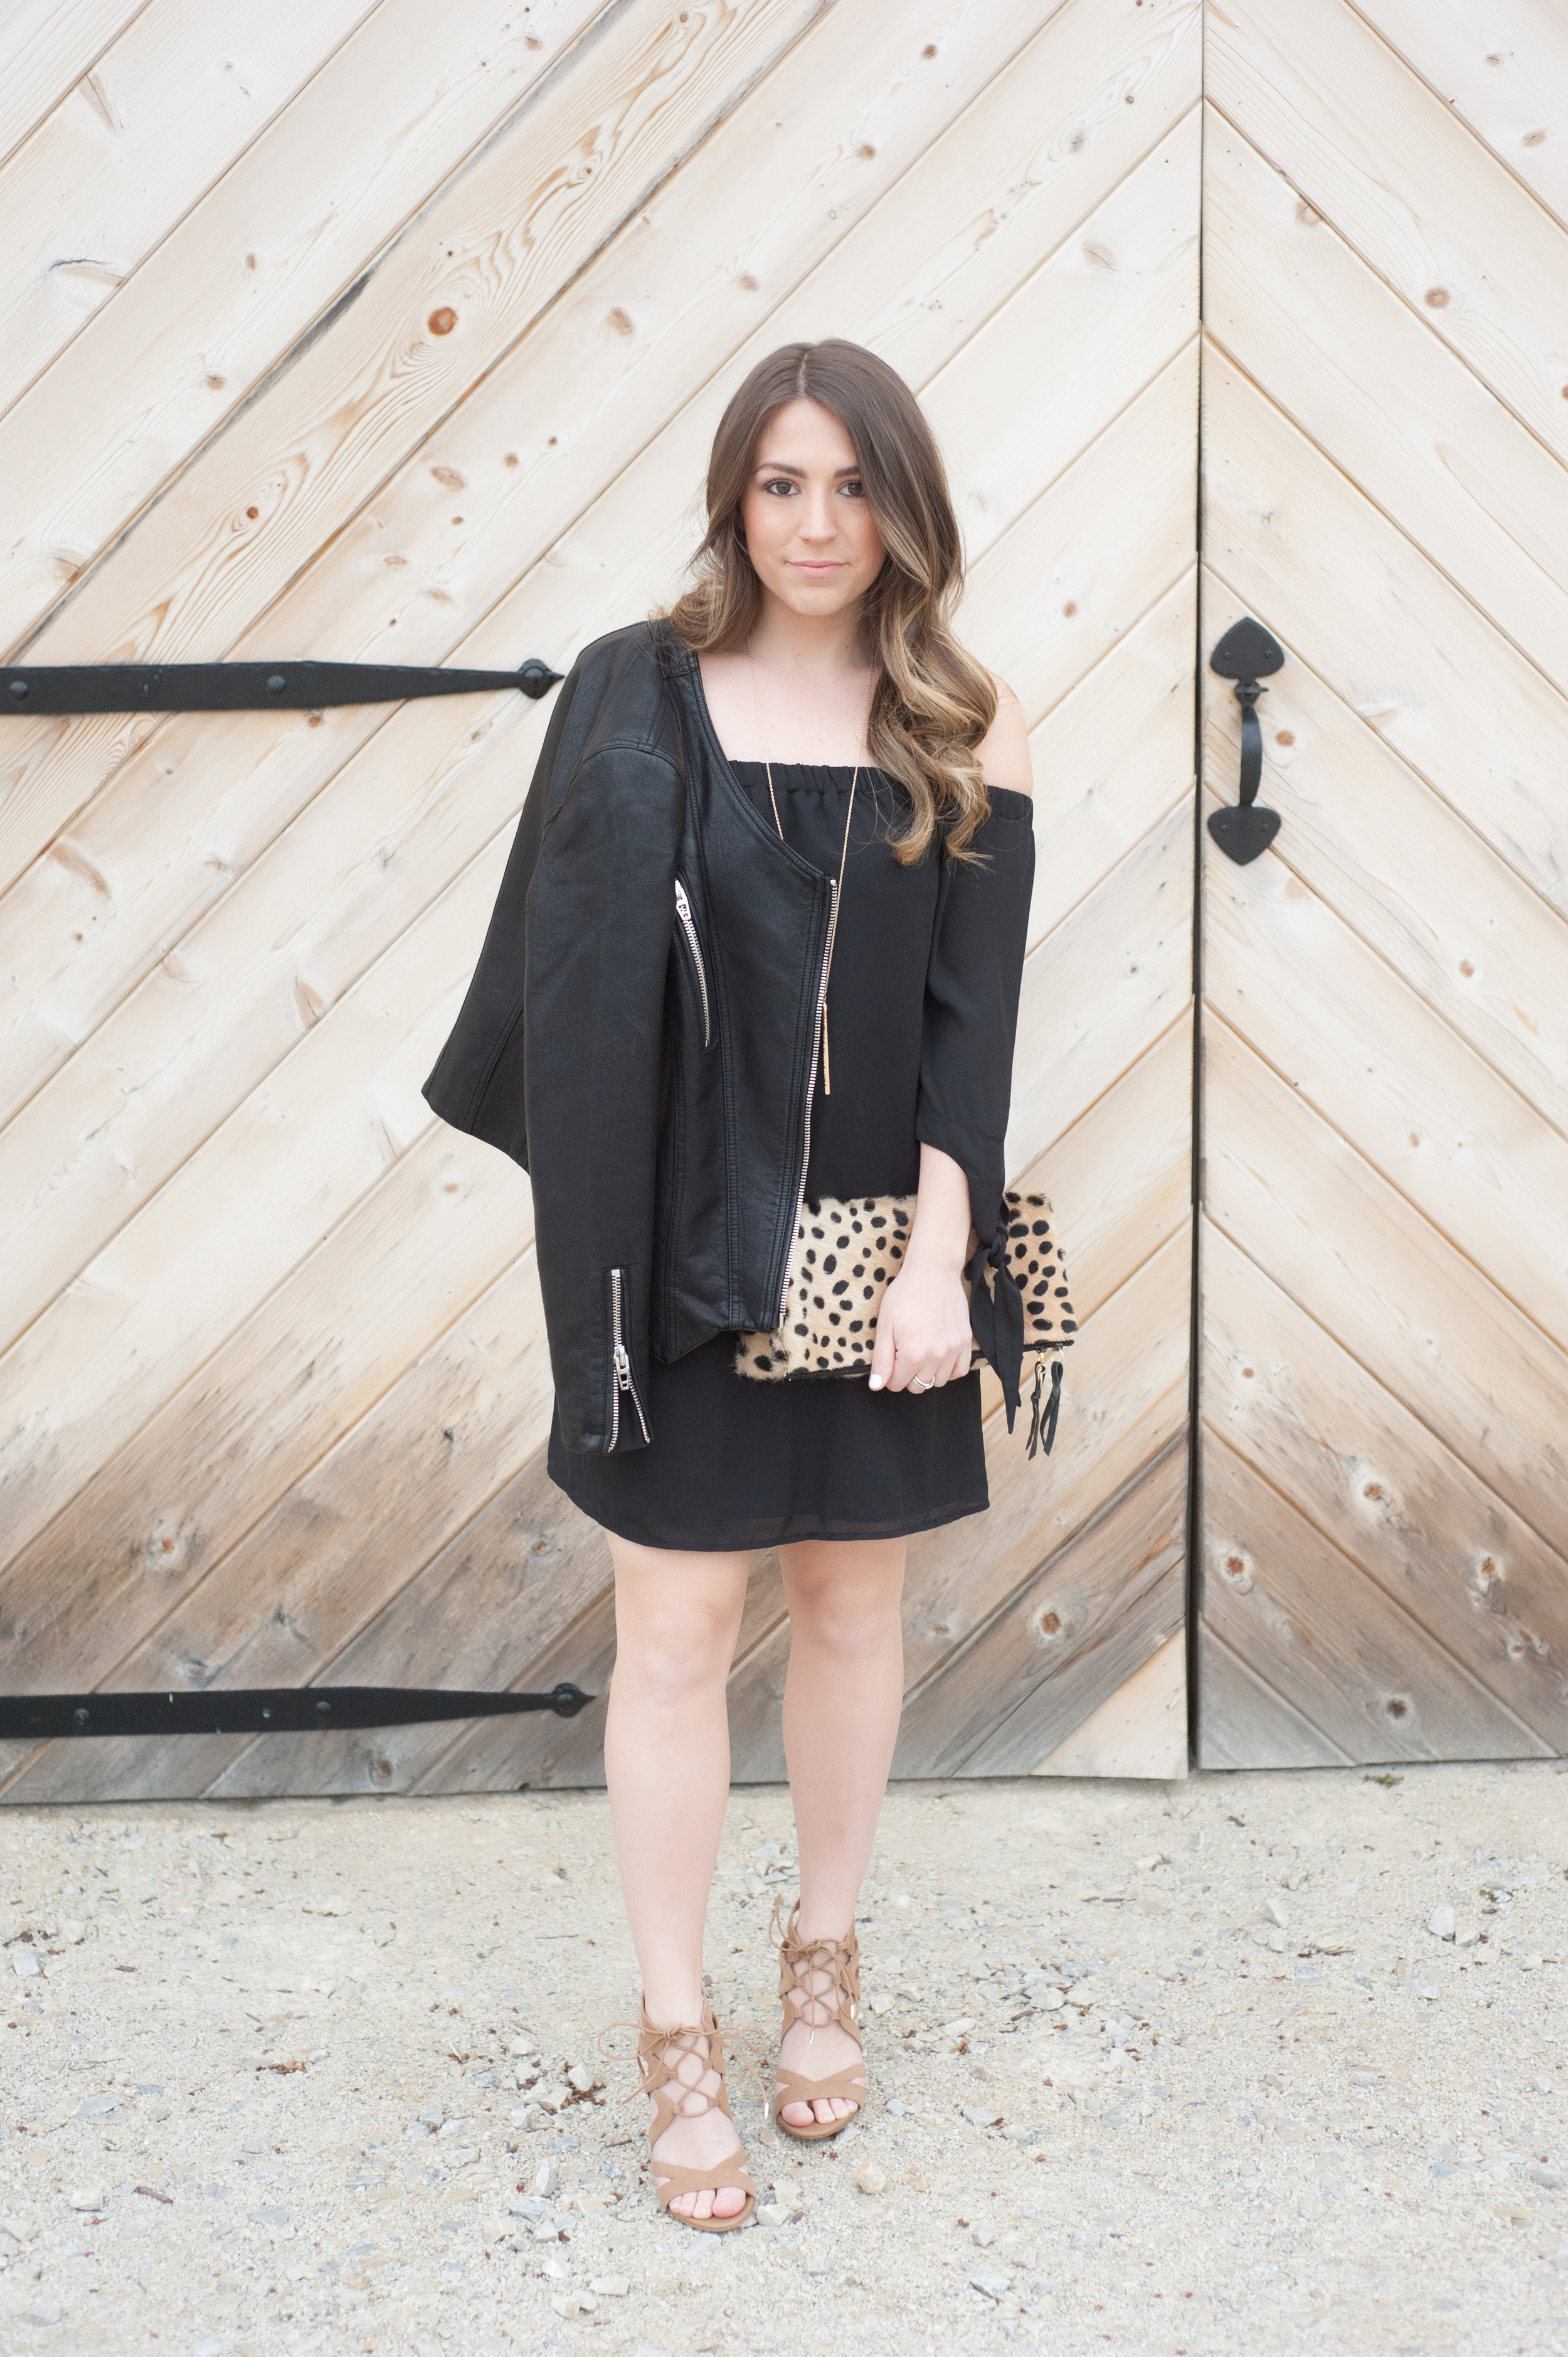 off the shoulder black dress + leather moto jacket / spring transition outfit